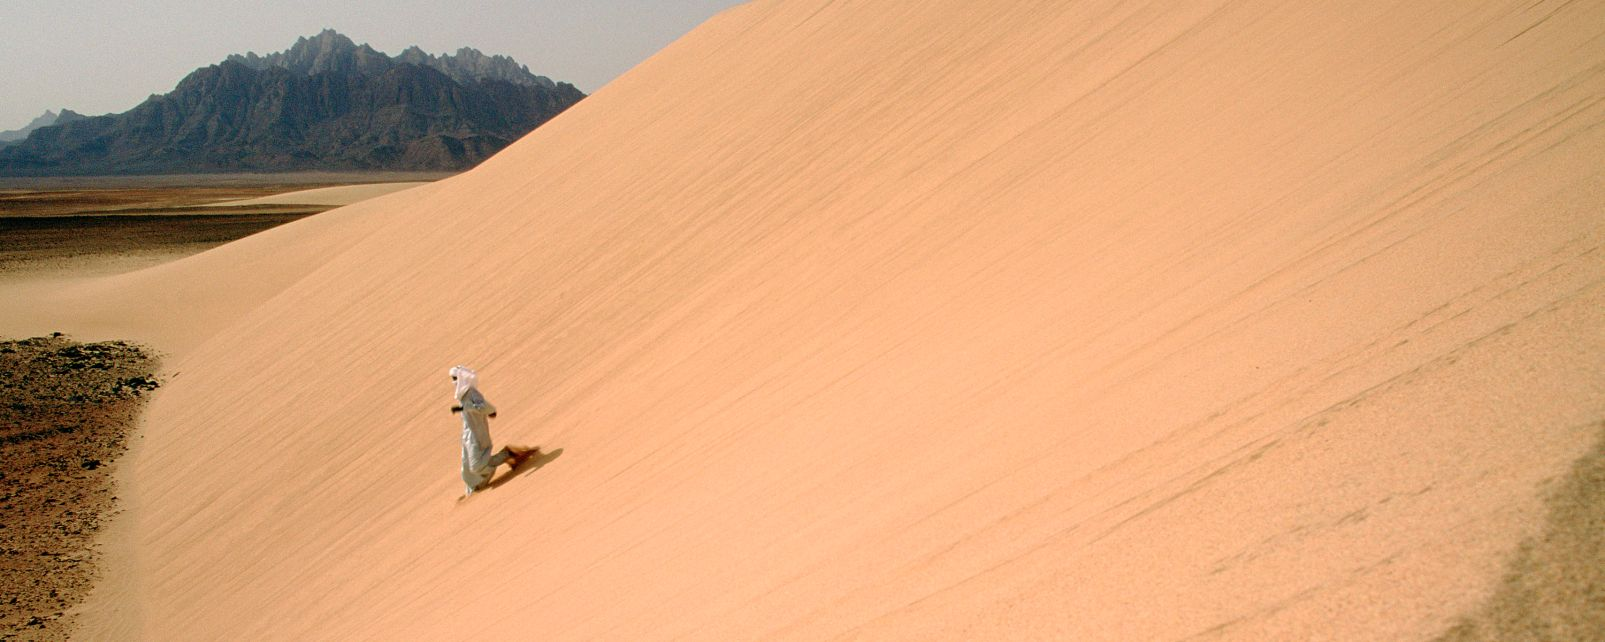 Tamanrasset, Algérie, hoggar, désert, sahara; afrique; maghreb; dune; berbère;